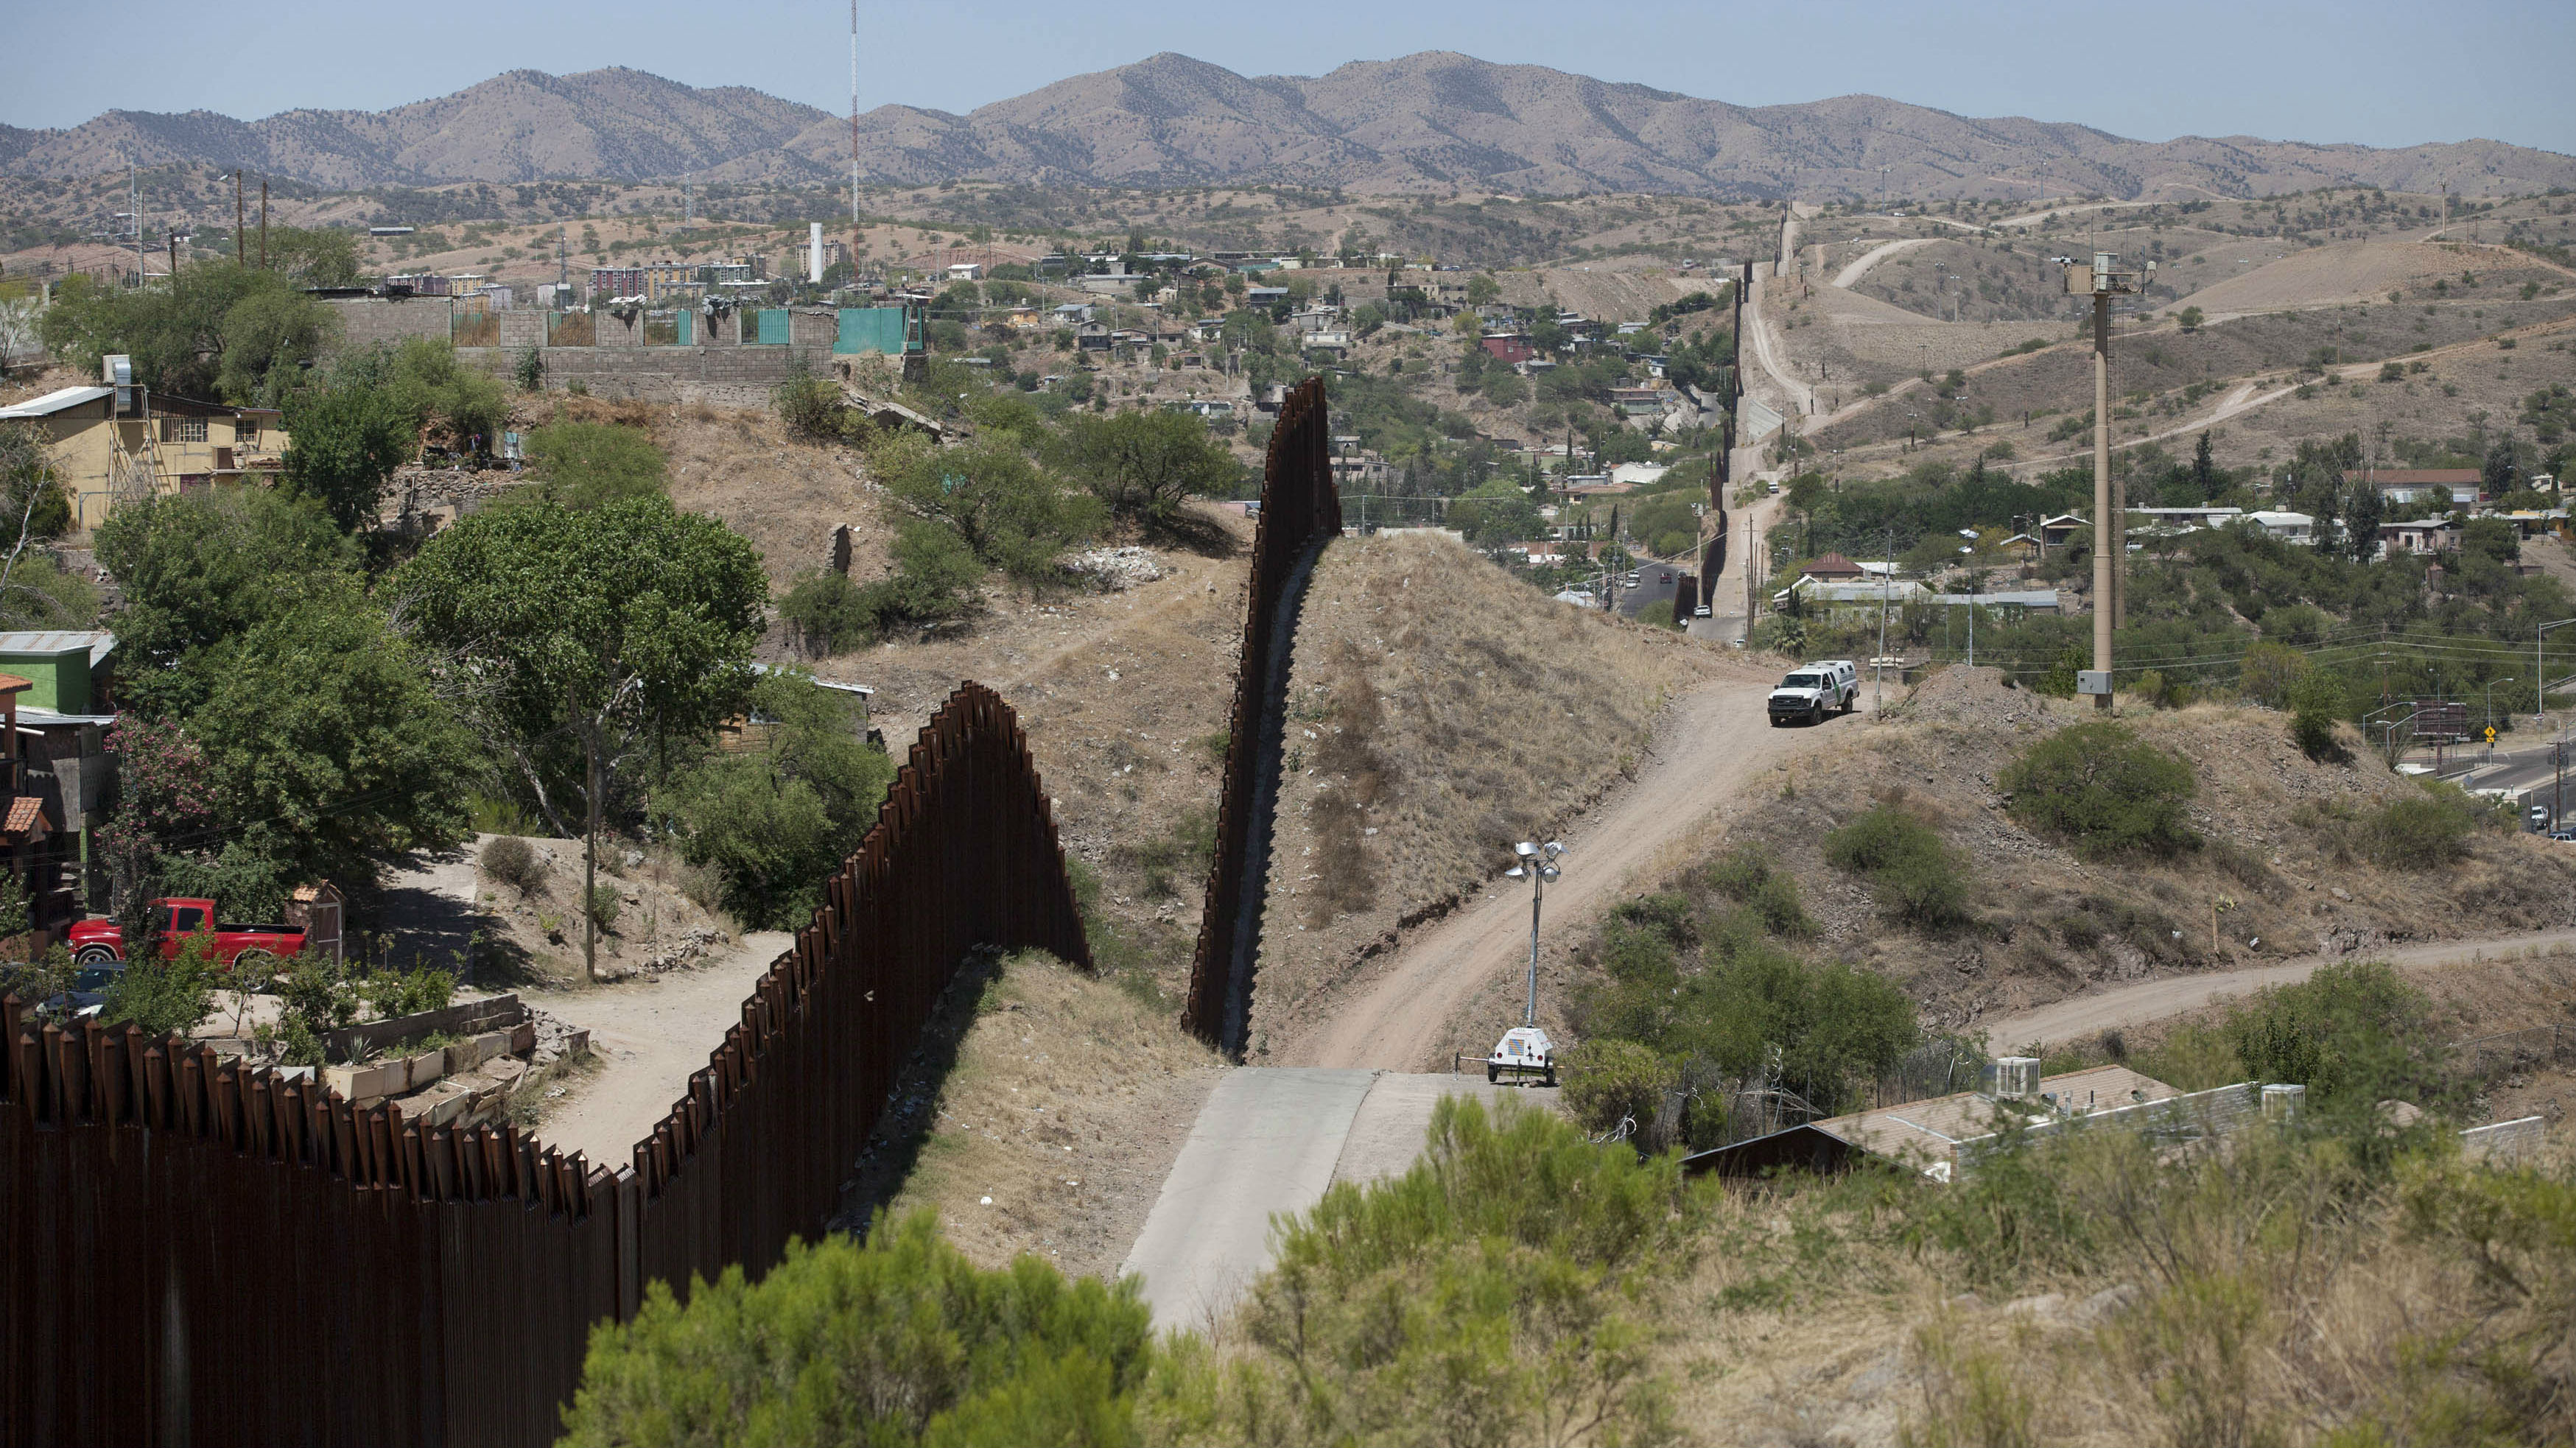 RTR3QG87 22 May. 2014 Nogales, UNITED STATES A view of the U.S.-Mexico border is seen in Nogales, Arizona May 22, 2014. REUTERS/Samantha Sais (UNITED STATES - Tags: POLITICS)